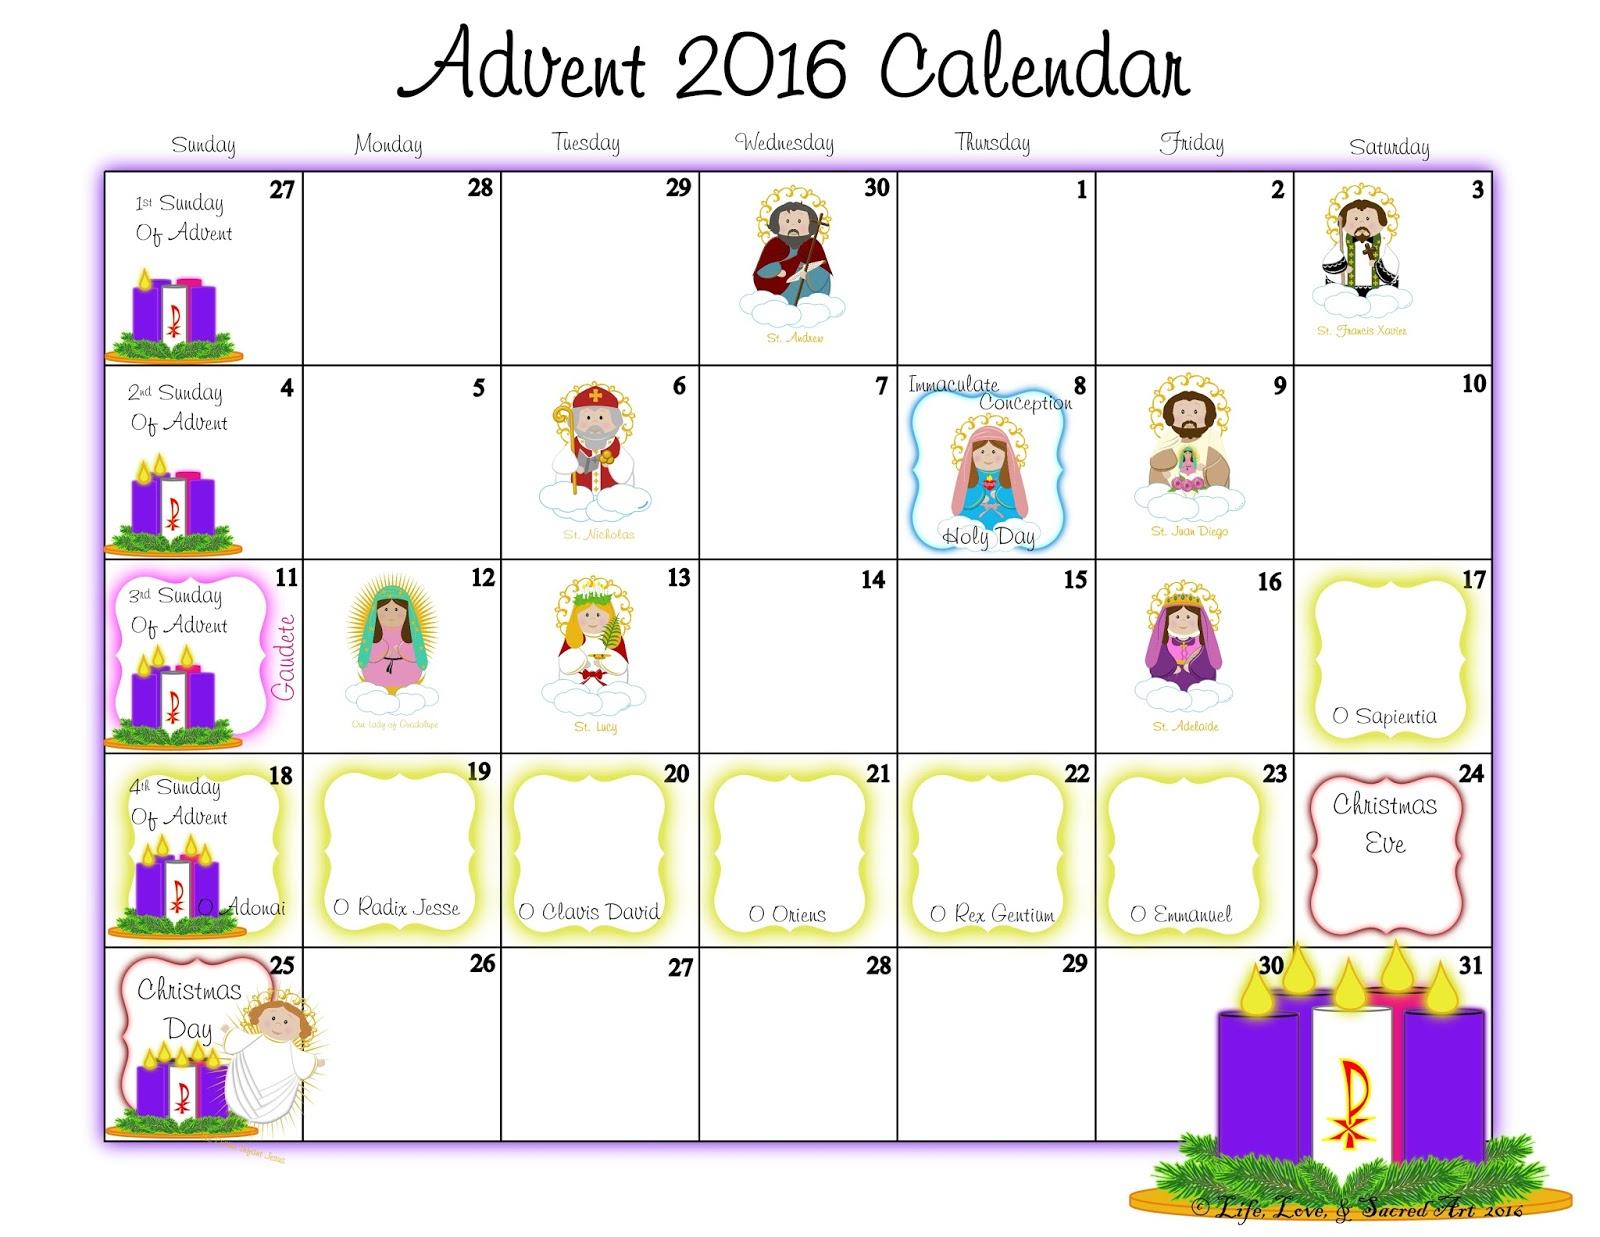 Life, Love, & Sacred Art: November 2016 pertaining to Catholic Advent Calendar Printable